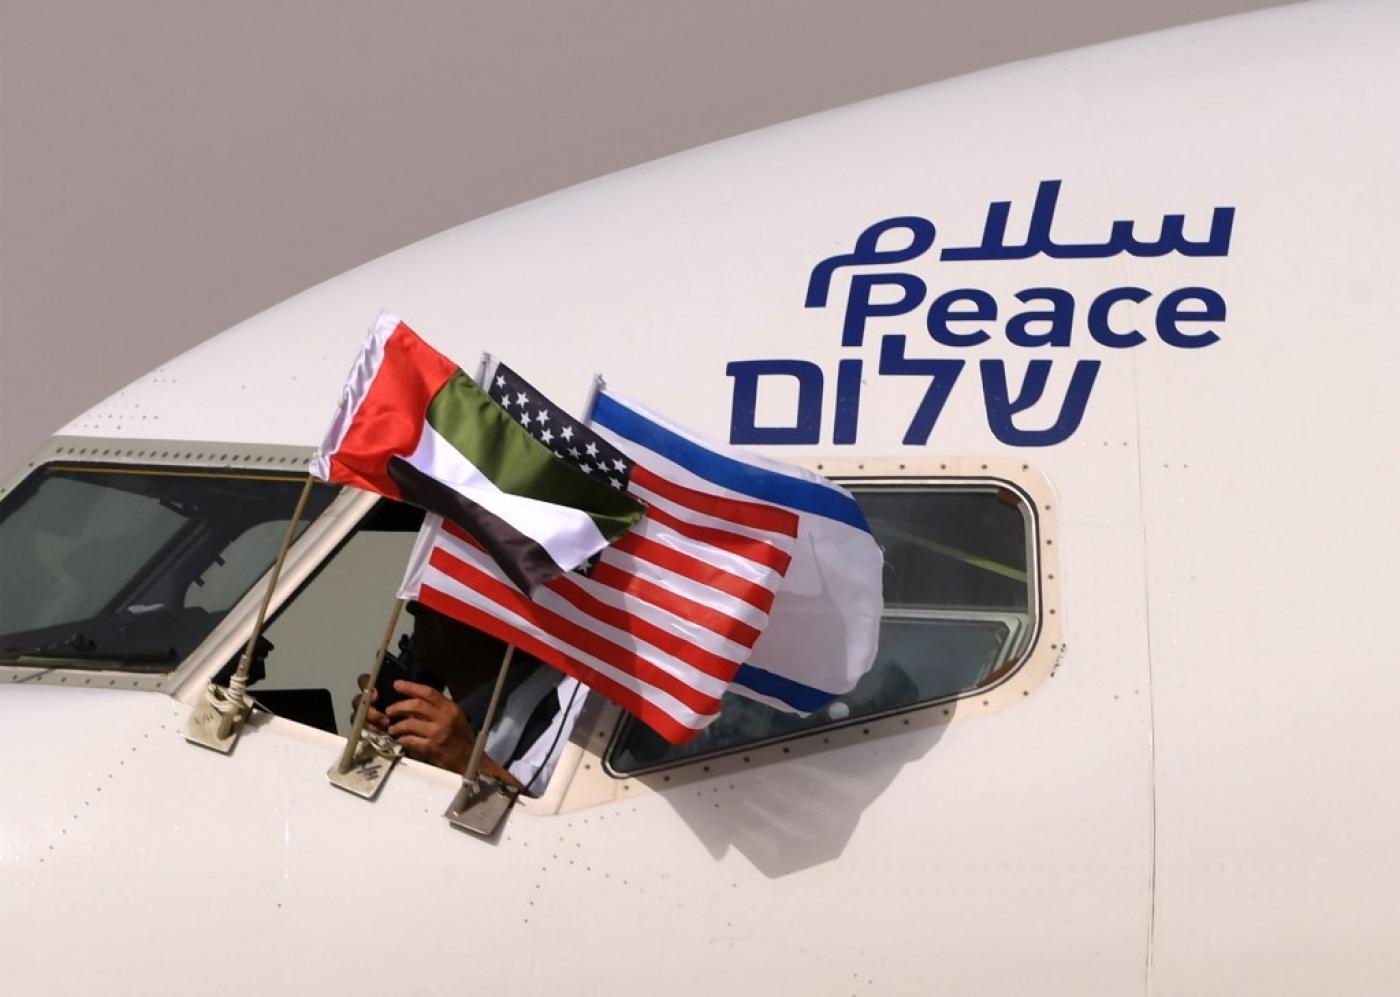 Israel's flight to the UAE: Normalising apartheid